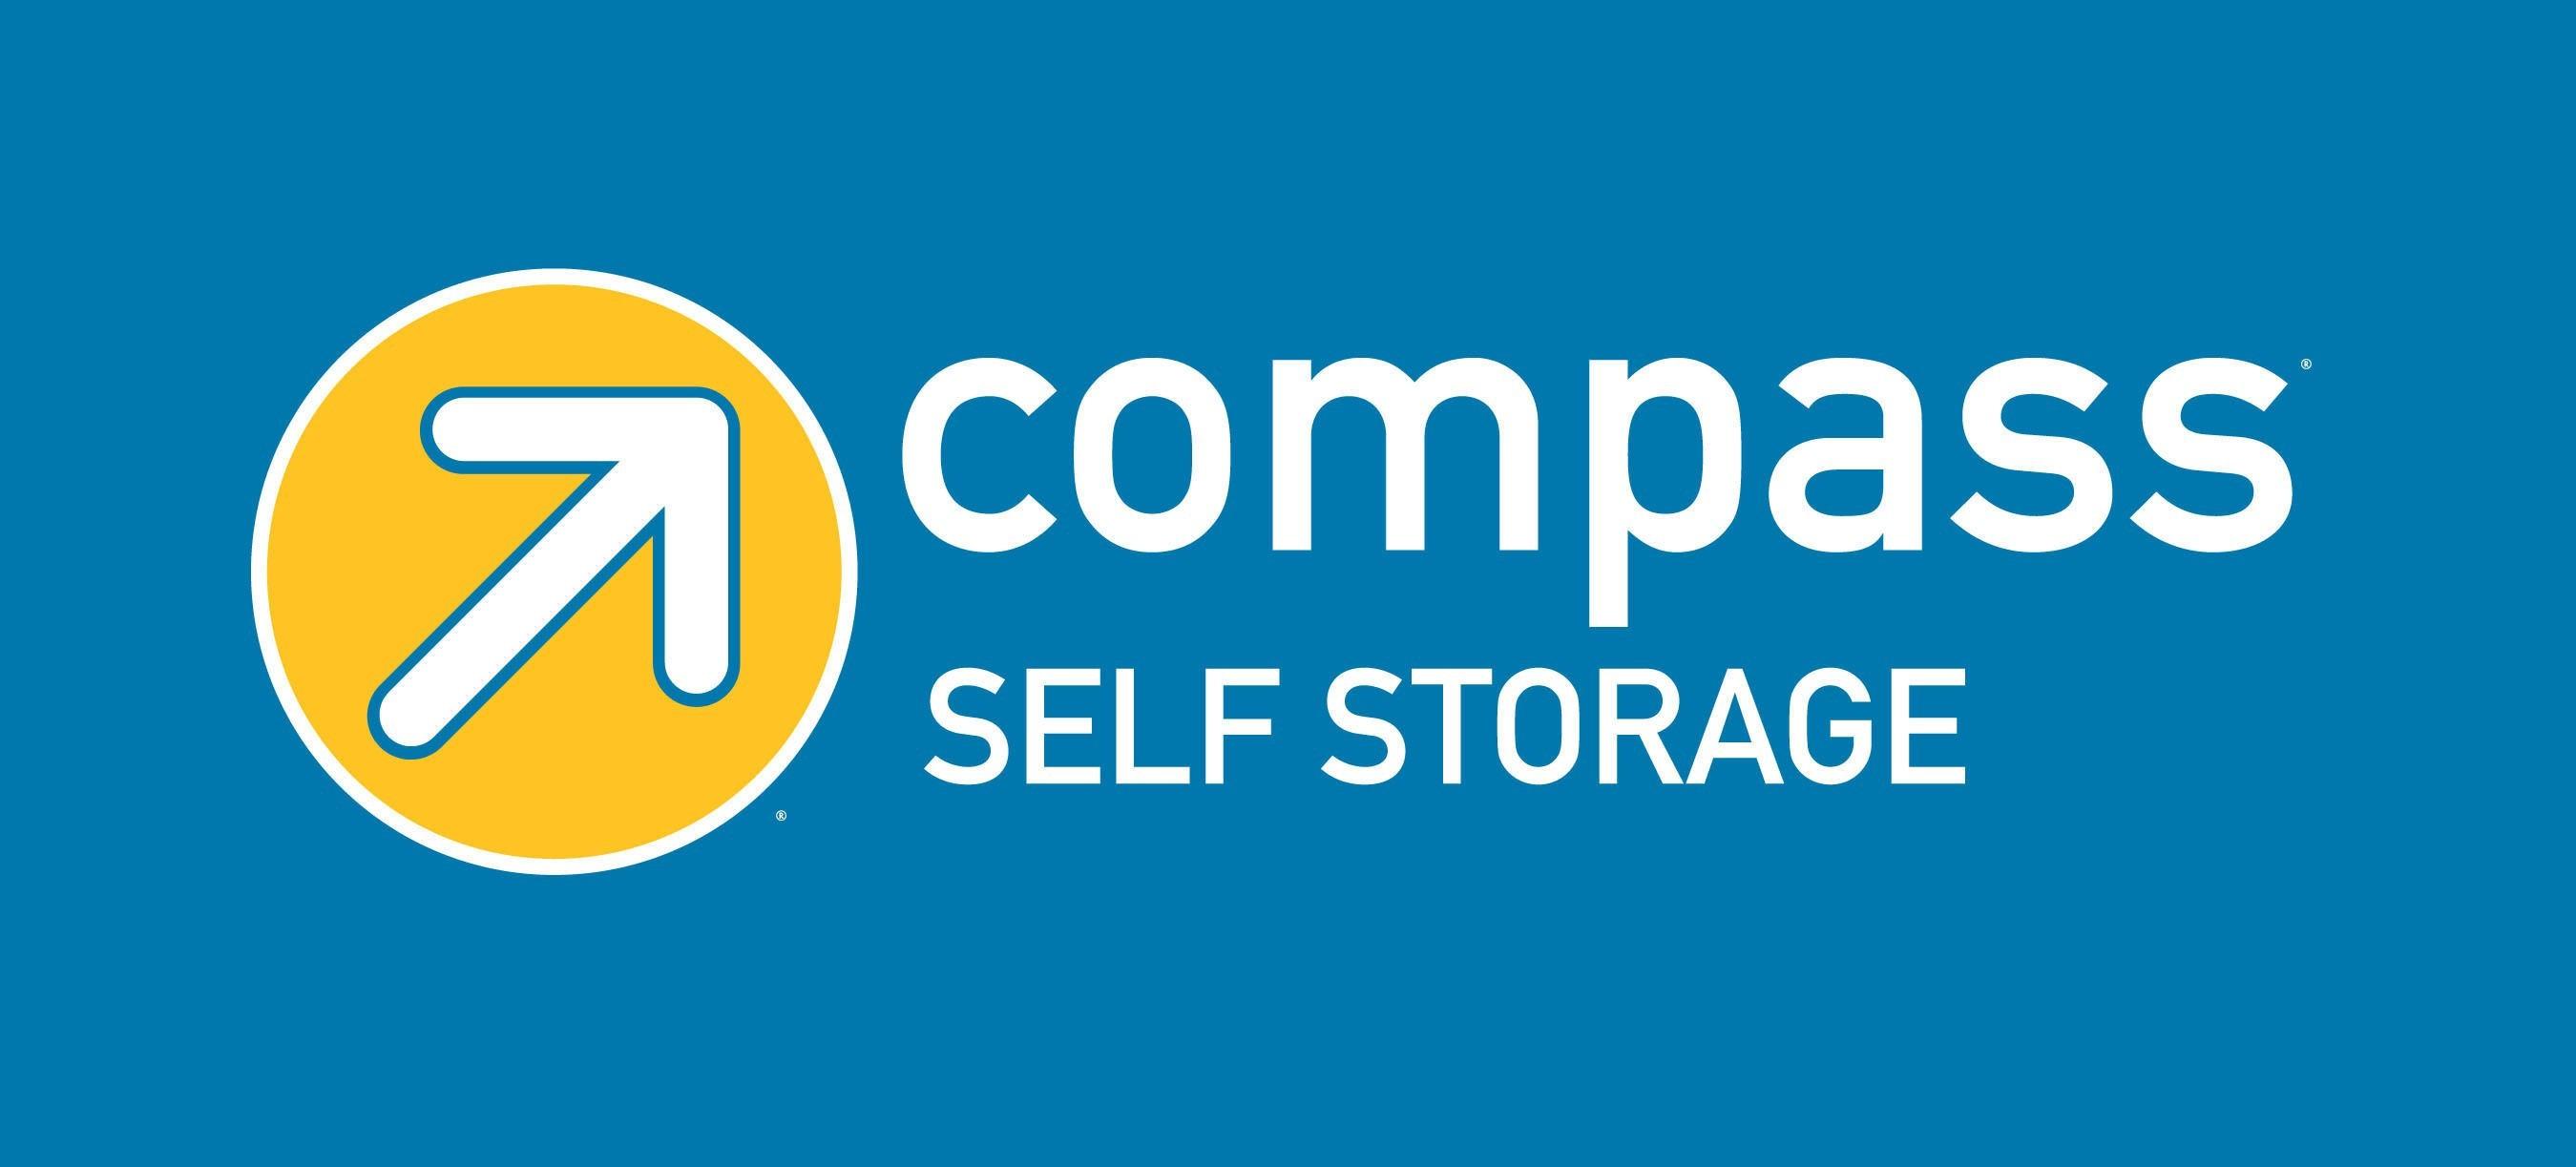 Compass Self Storage logo. (PRNewsFoto/Amsdell Companies) (PRNewsfoto/Compass Self Storage)